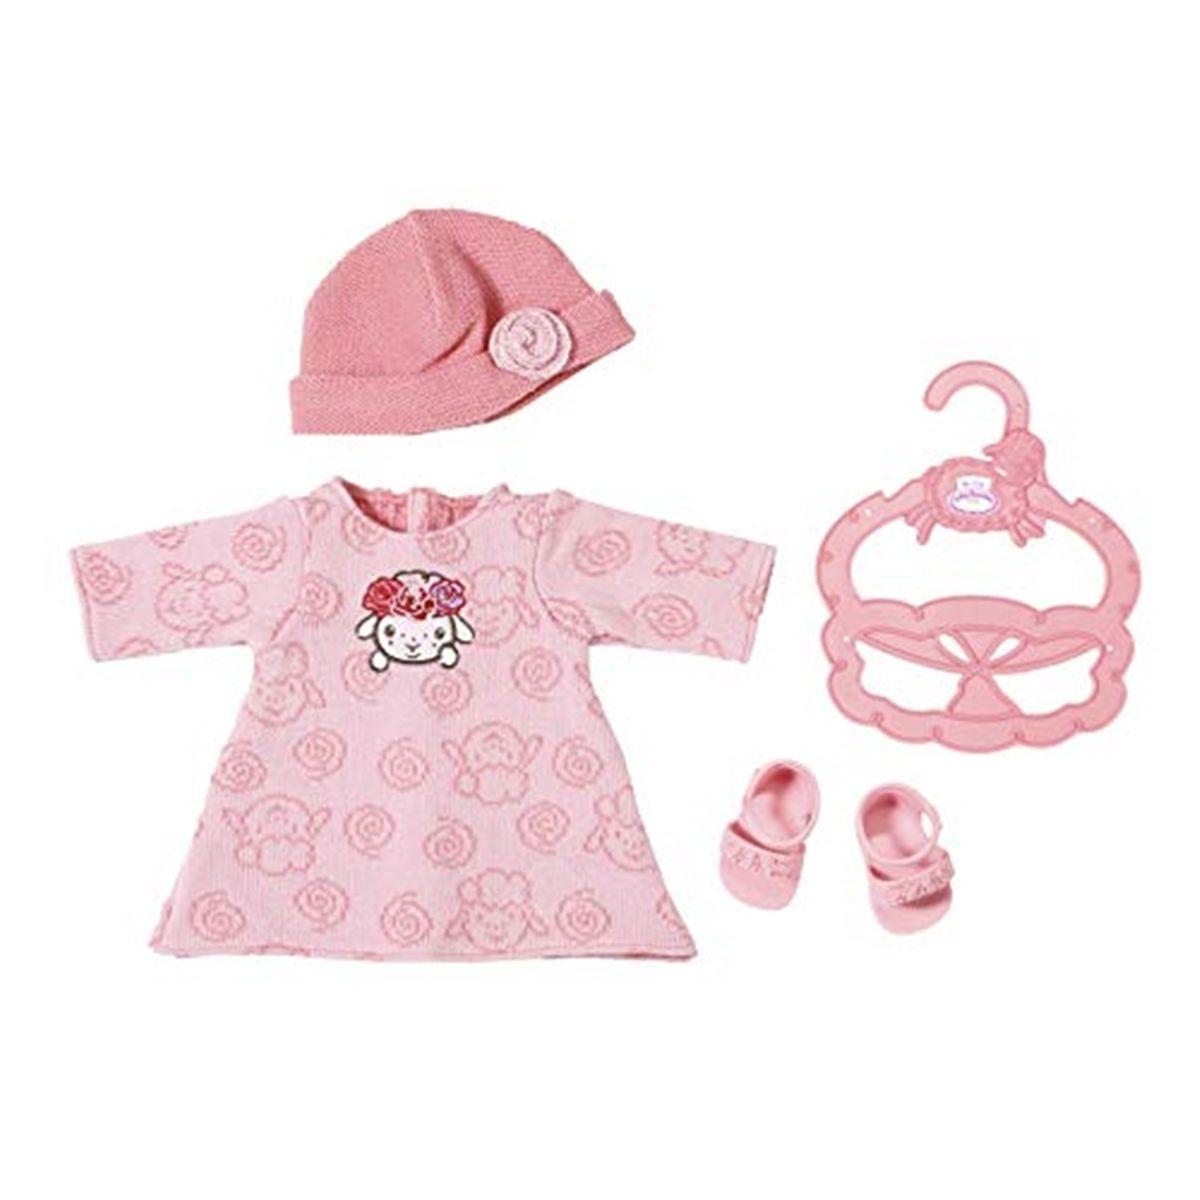 Baby Annabell - Robe en maille 36 cm